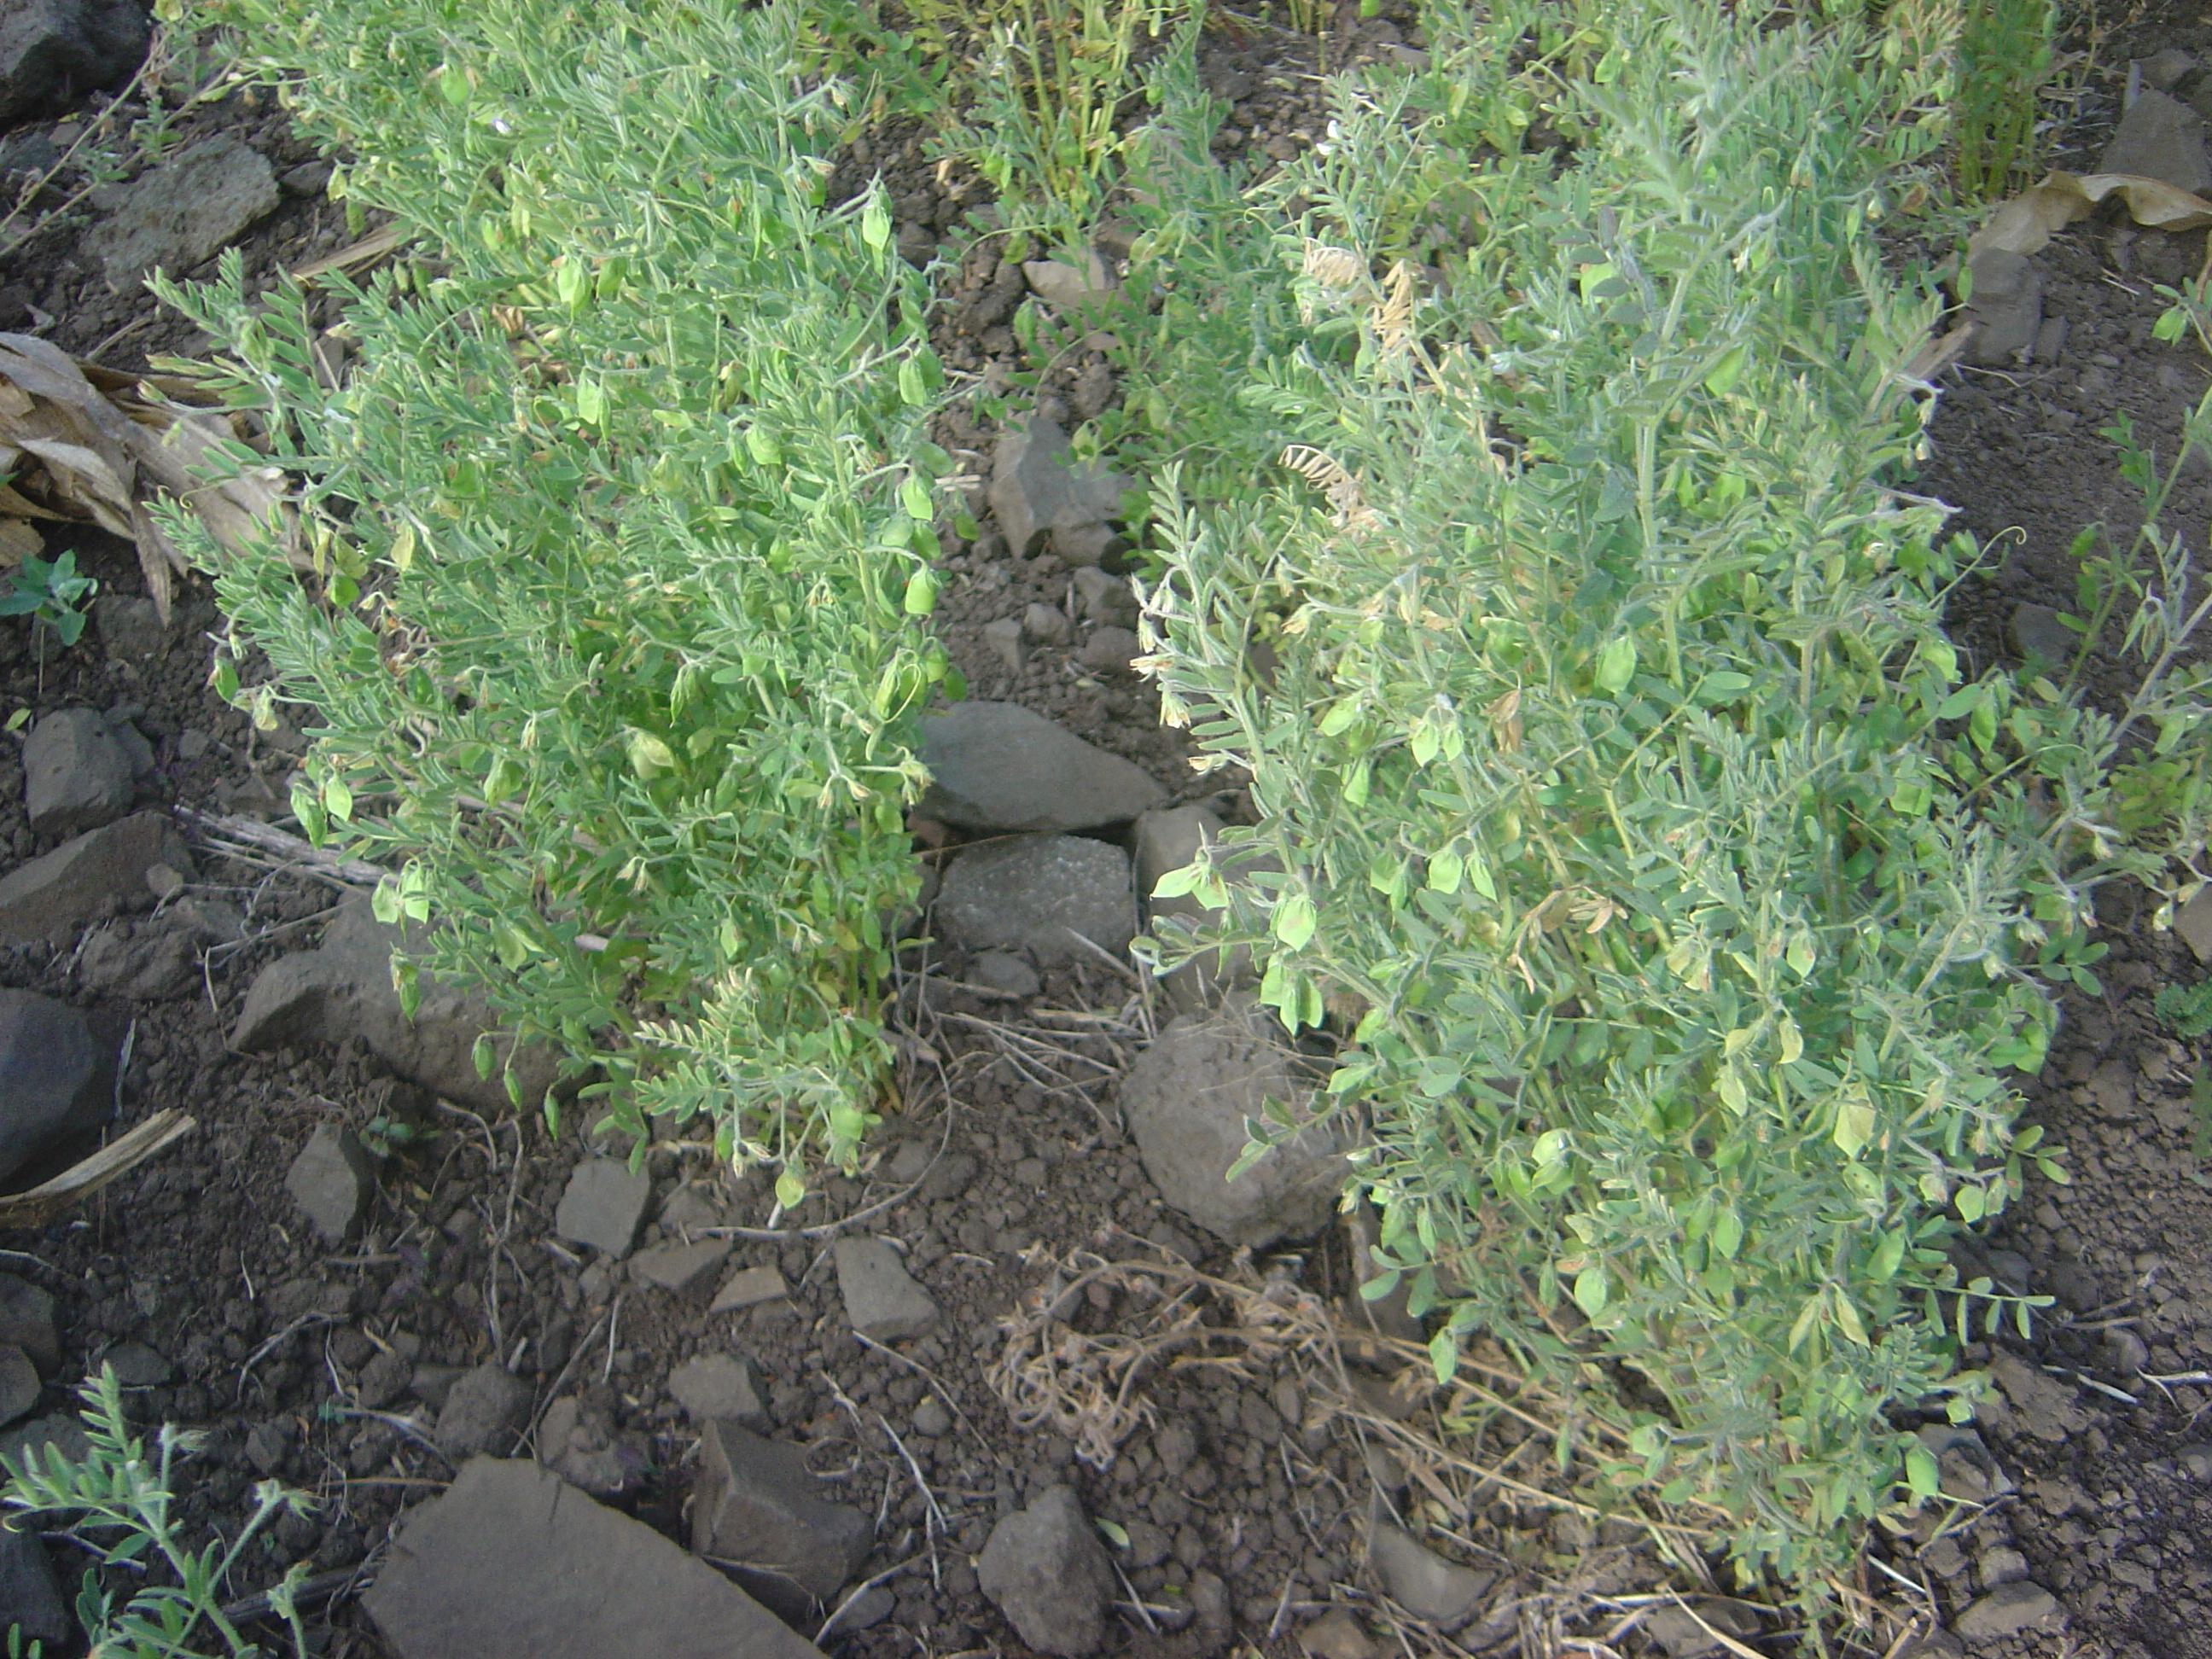 Mafate Marla lentils dsc00647.jpg